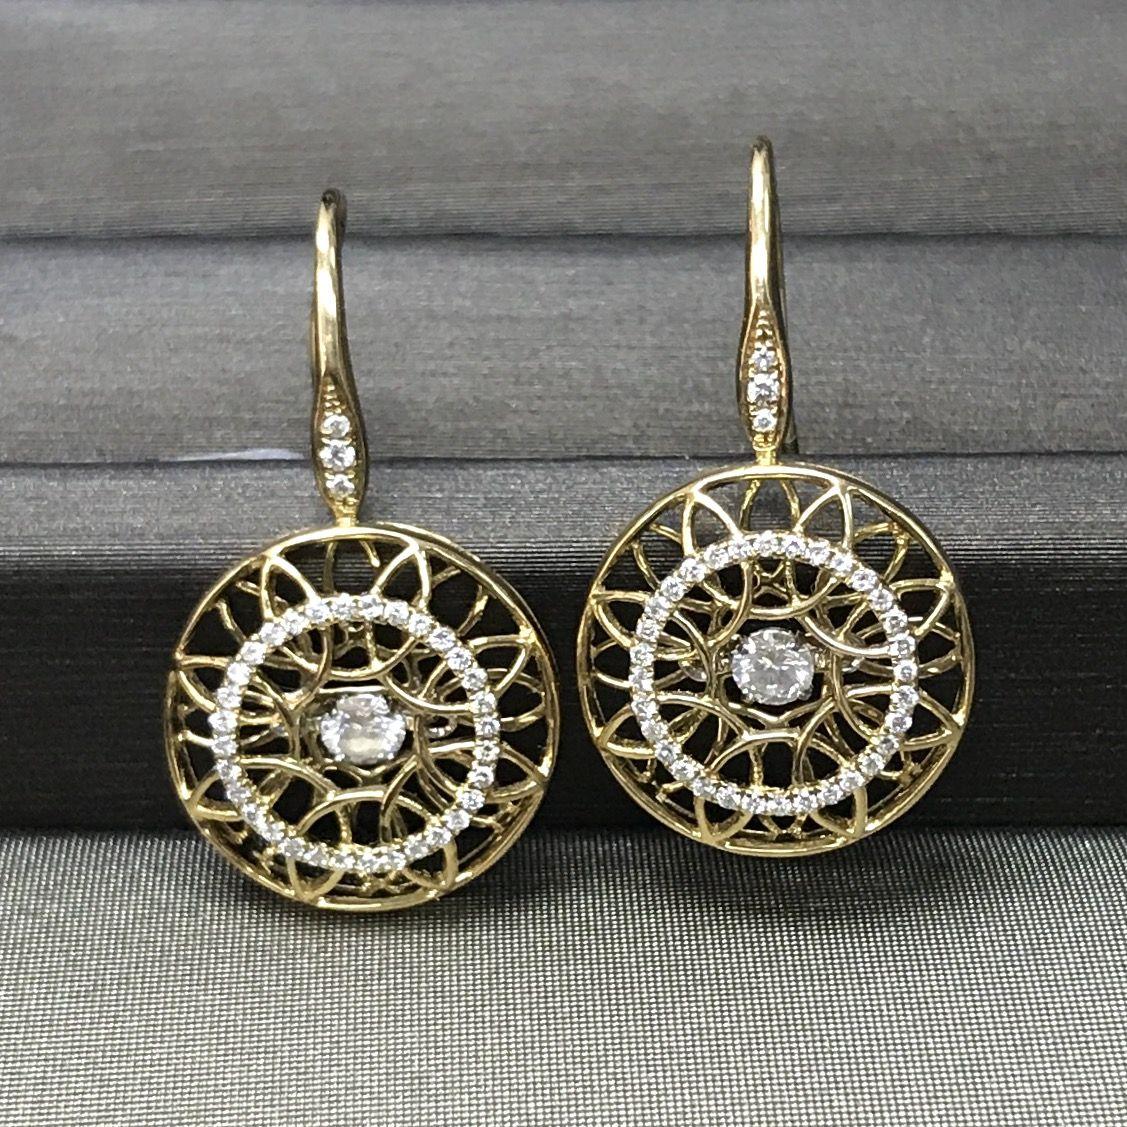 Dancing Diamond Earrings